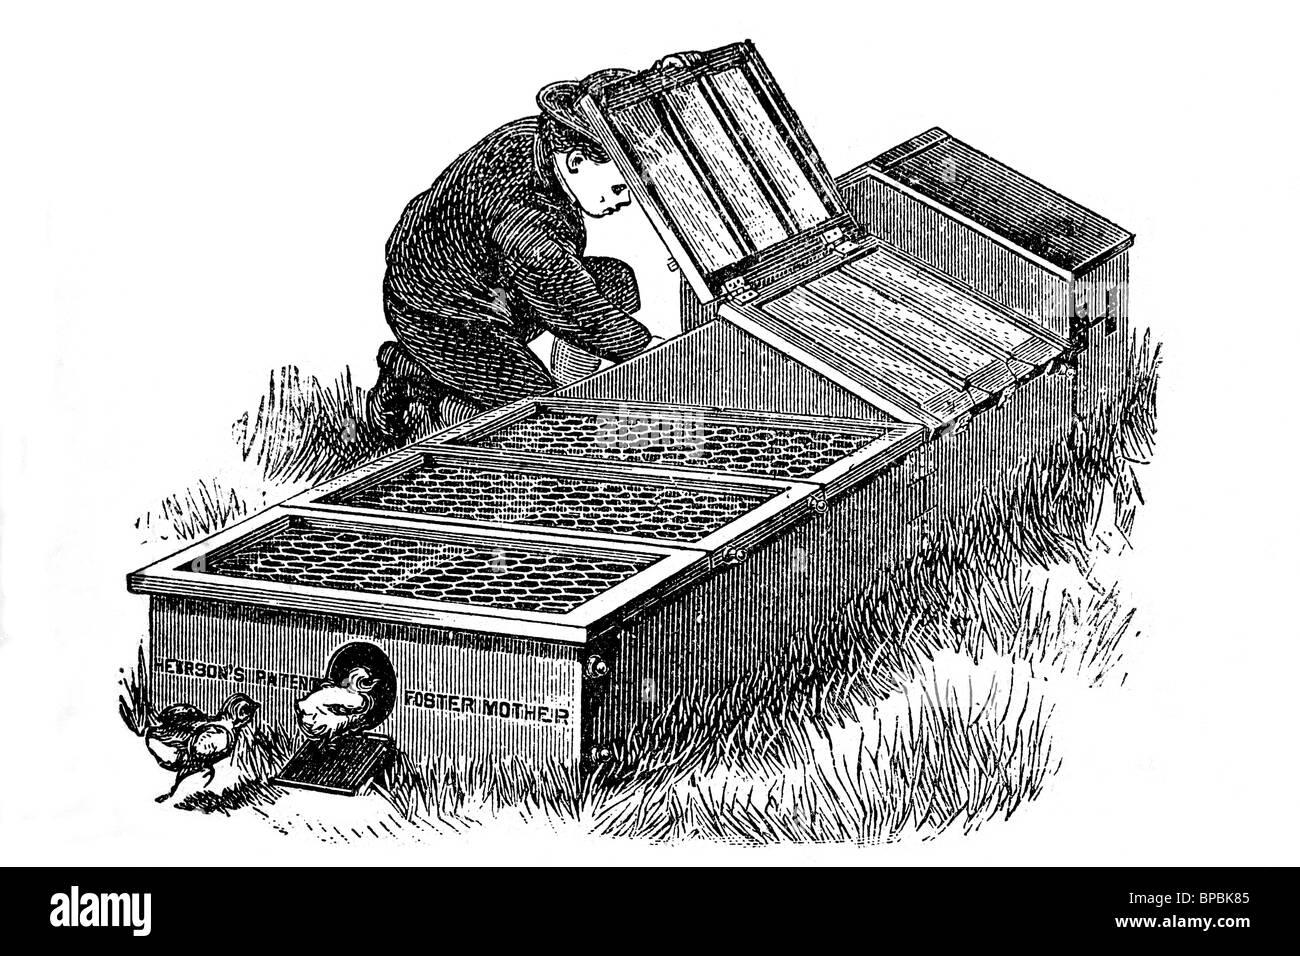 Breeding chicks. Antique illustration. 1900. - Stock Image